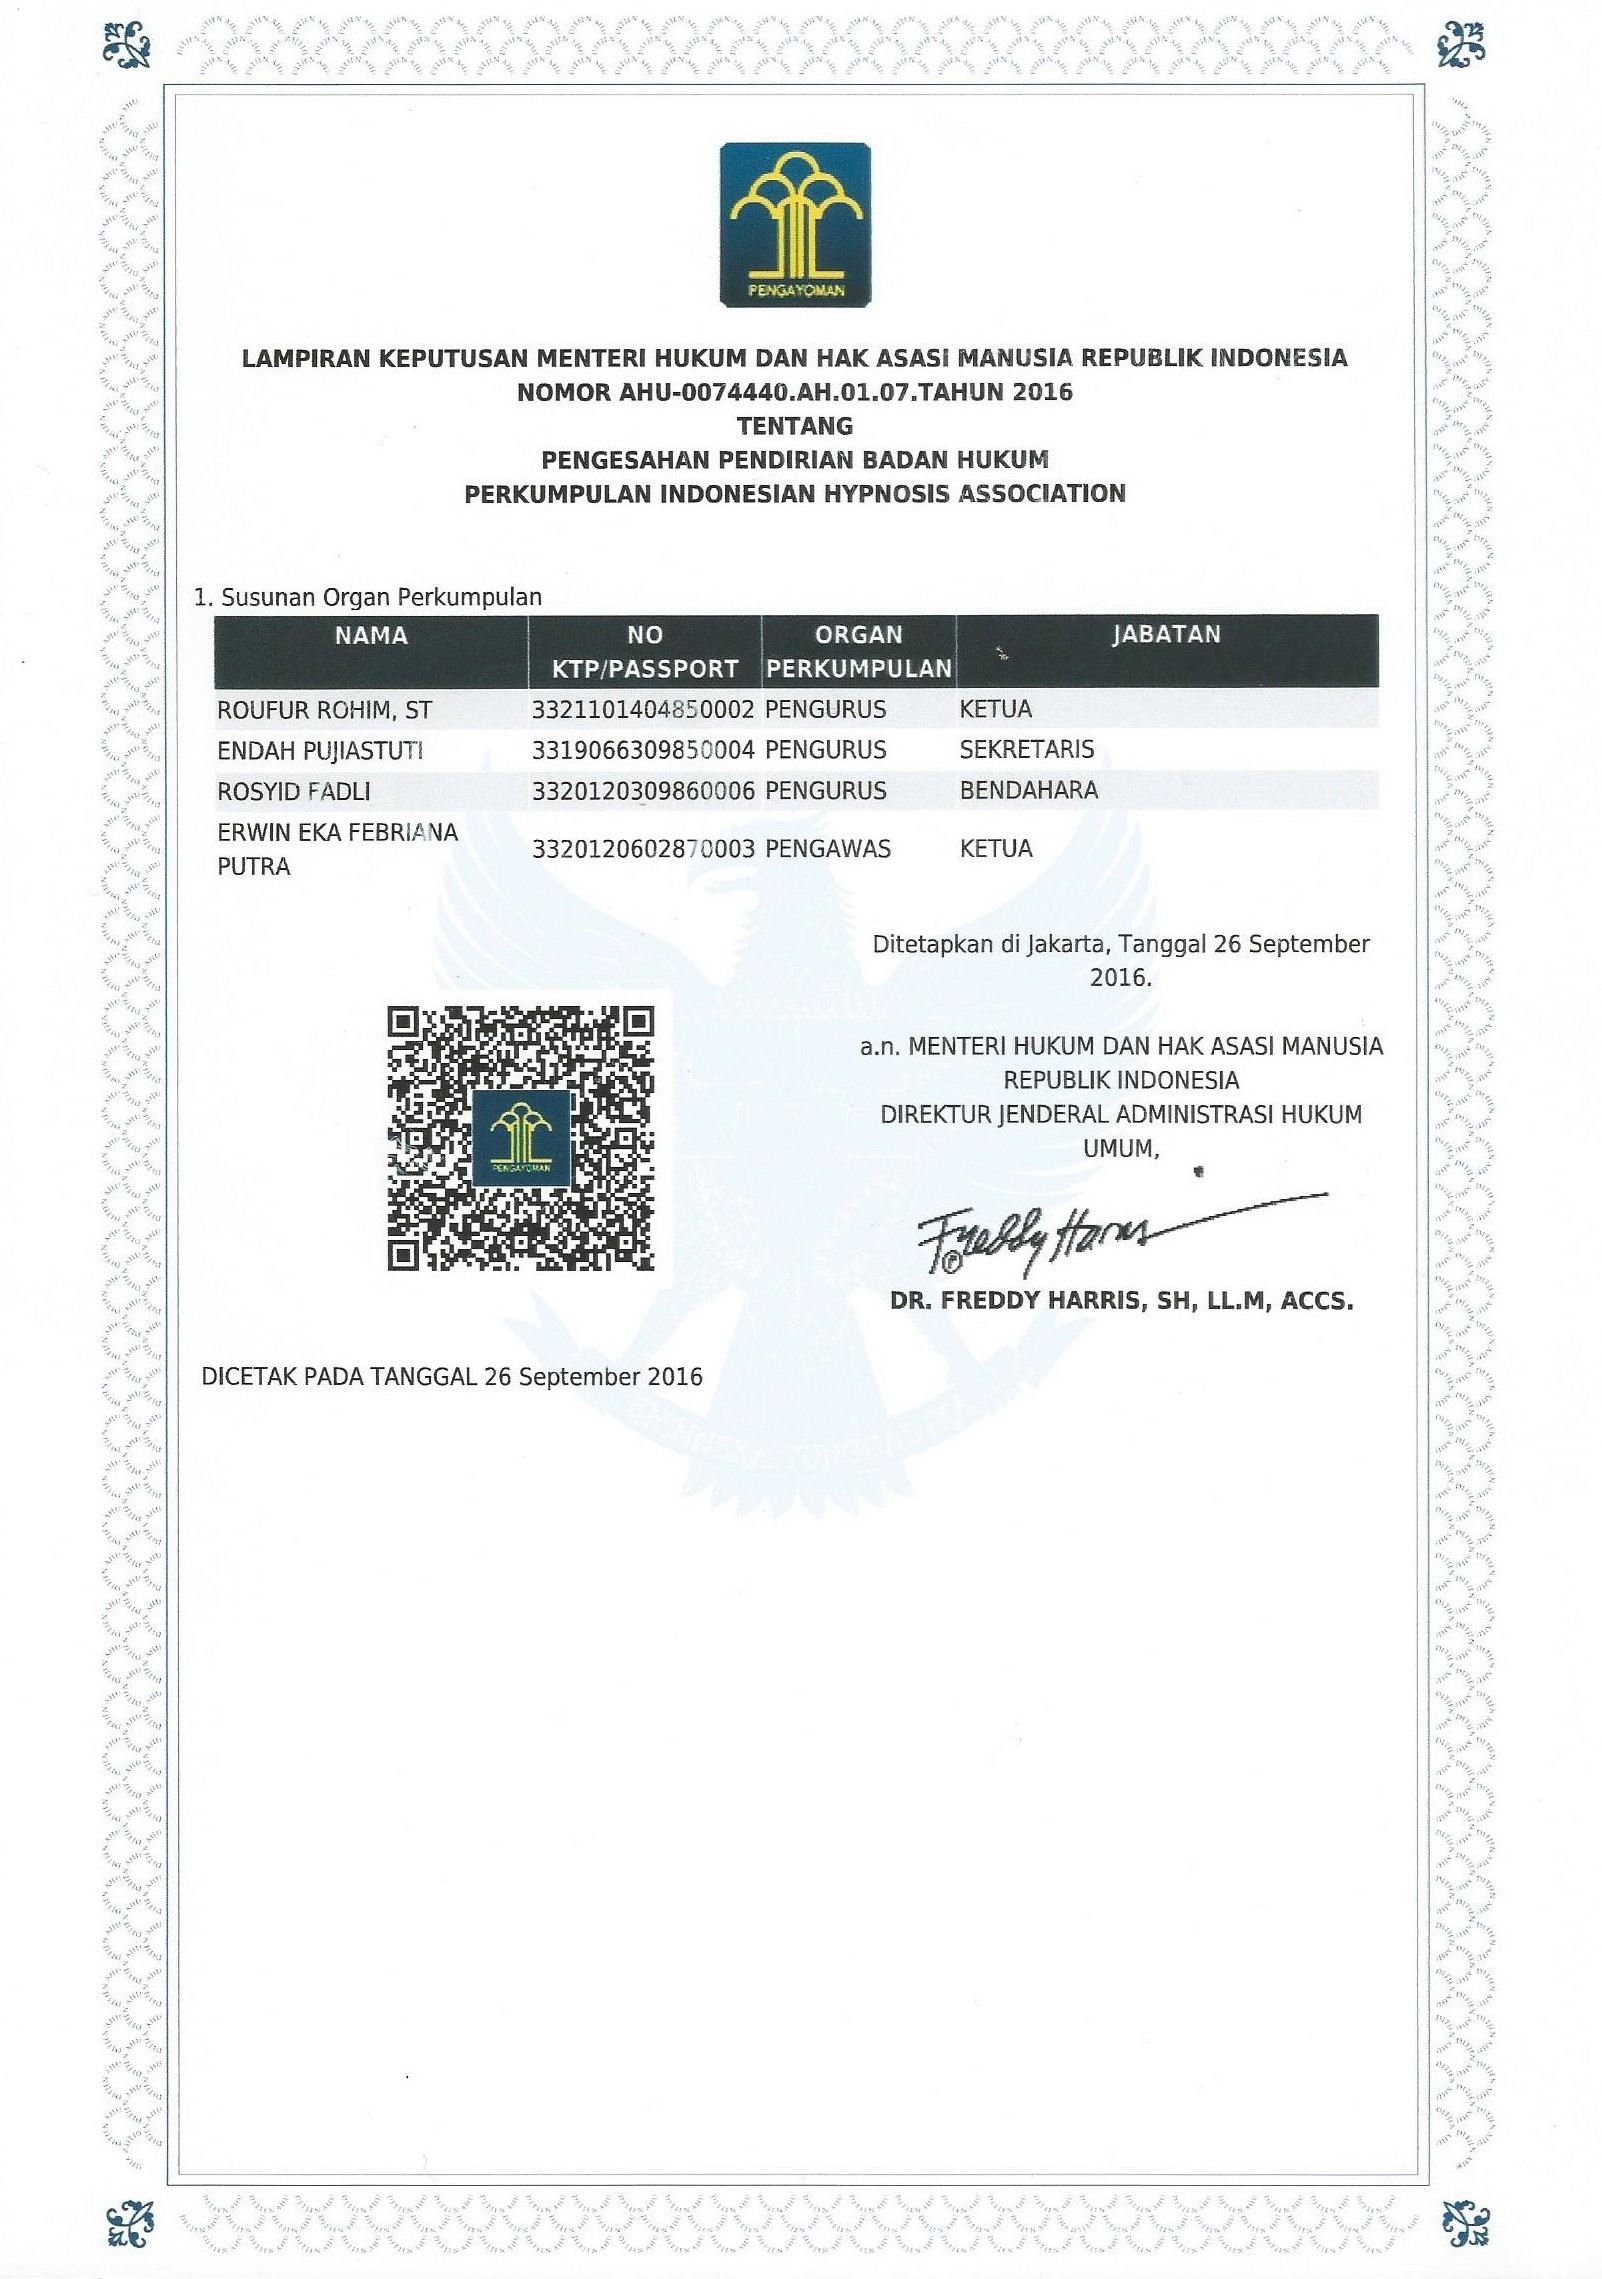 Lembaga Pelatihan Hipnoterapi Bersertifikat Resmi